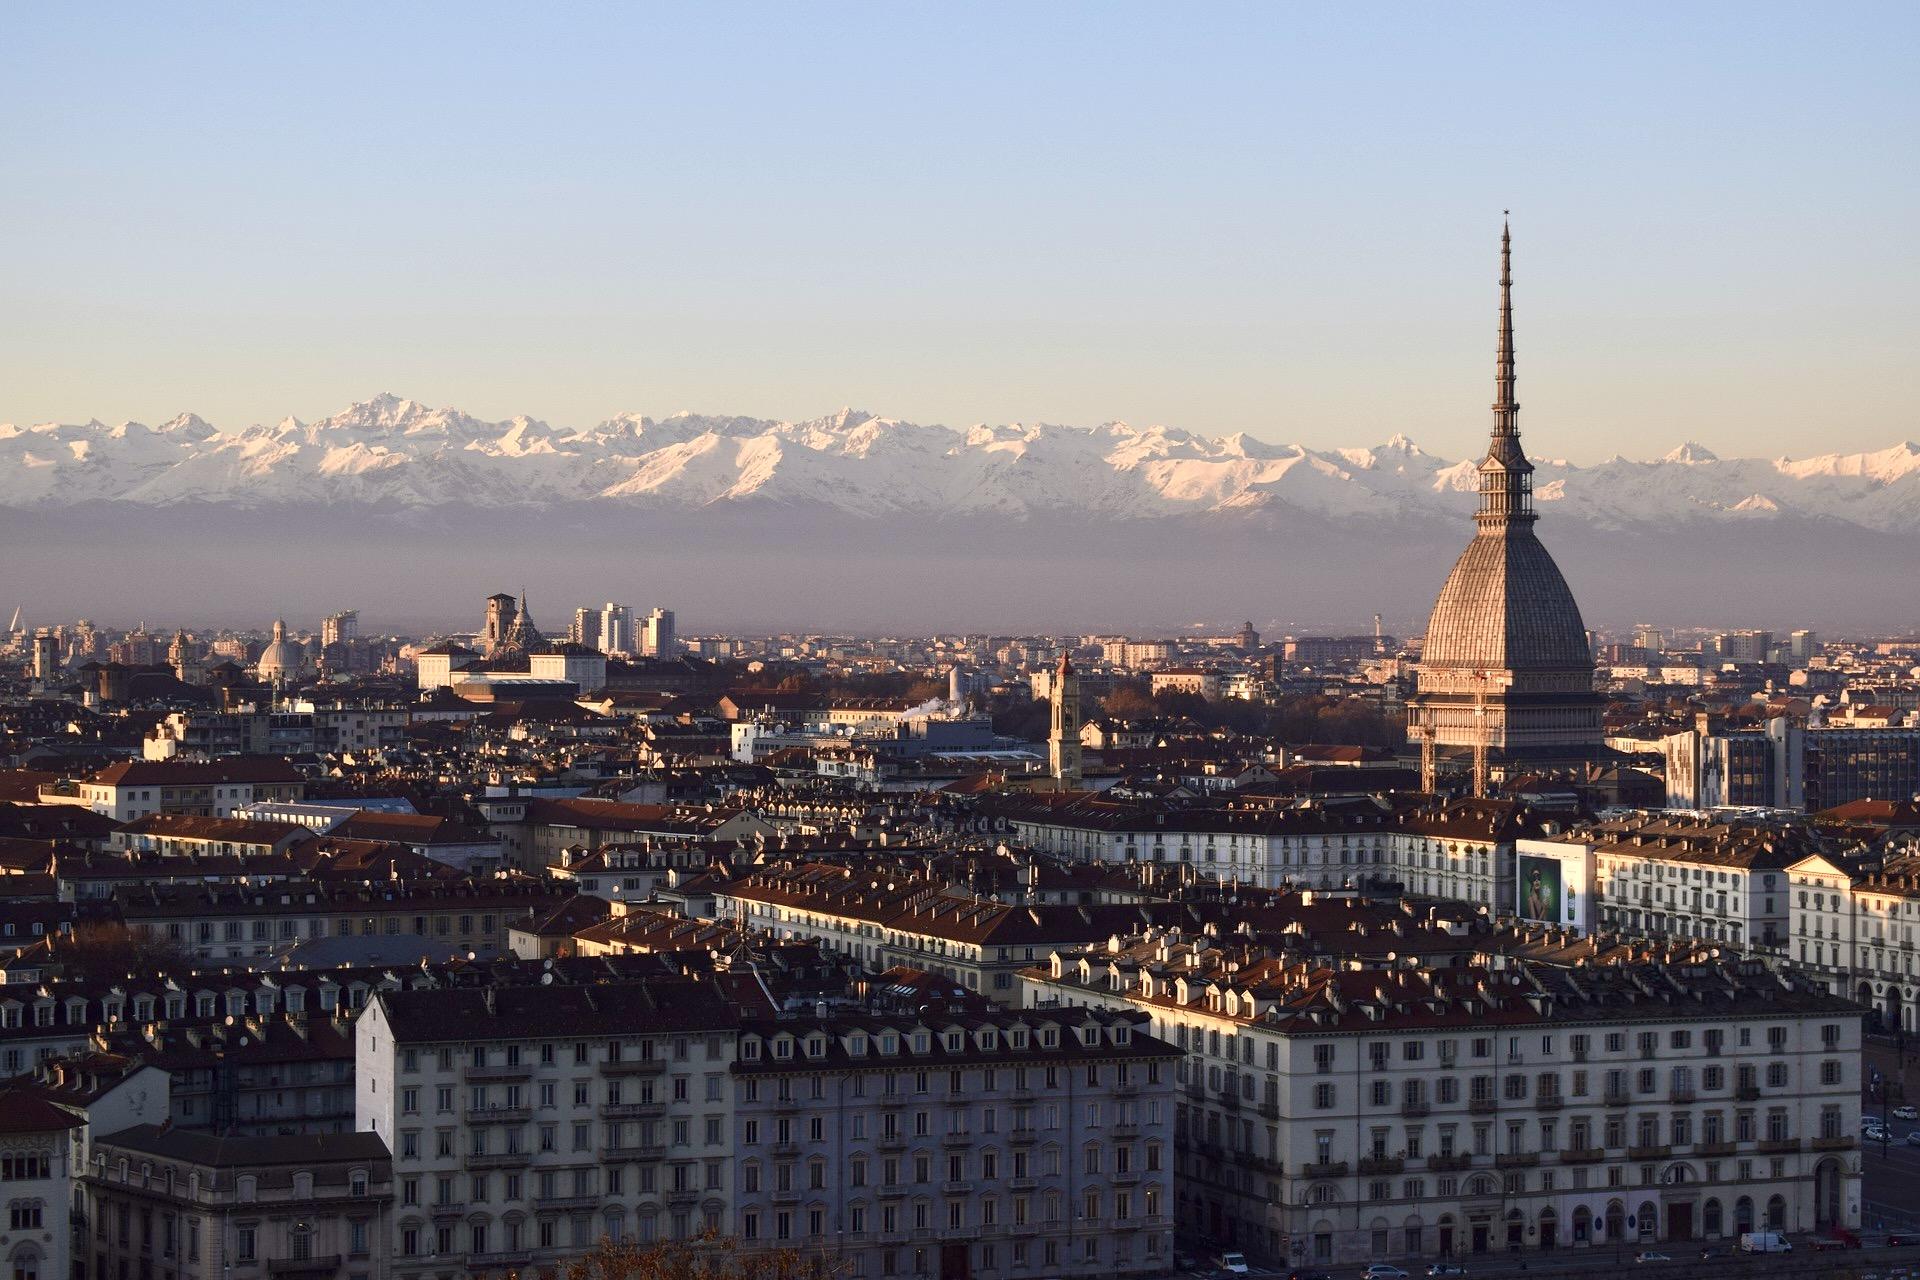 Turin in Norditalien als Städtereise-Ziel